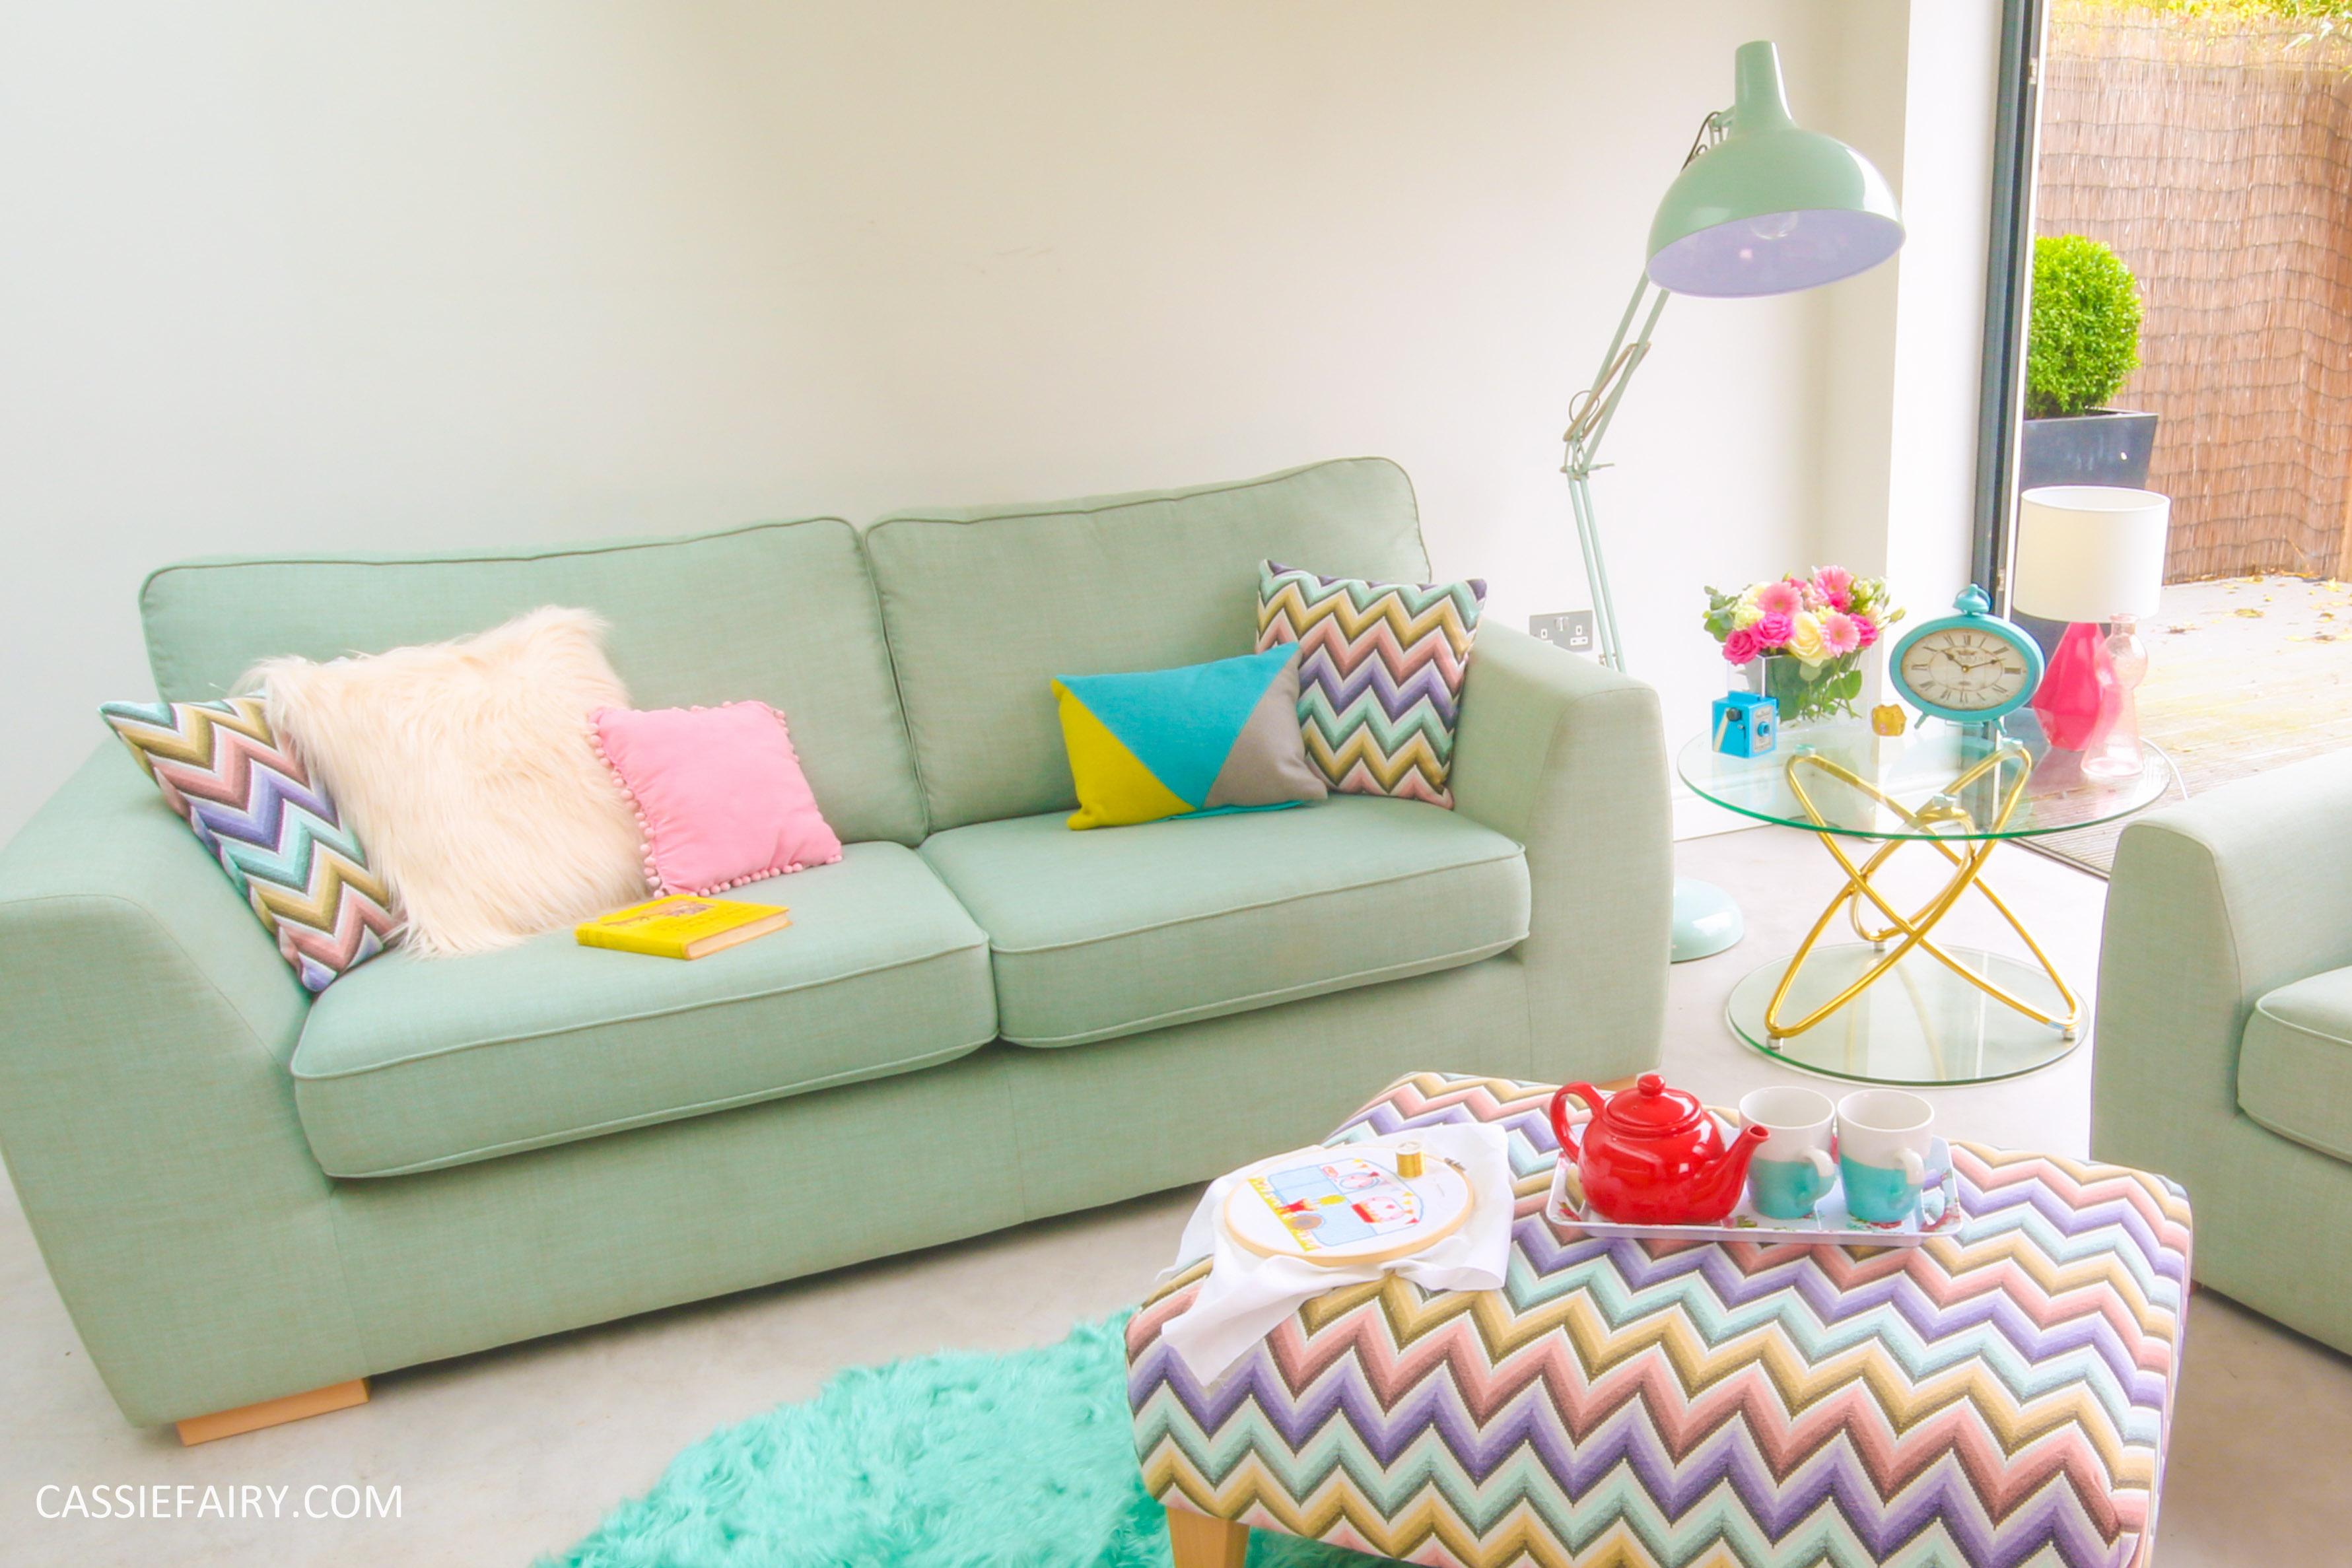 DFS Candy Colours Interior Design Inspiration For Spring Summer 2016 Sofa 2